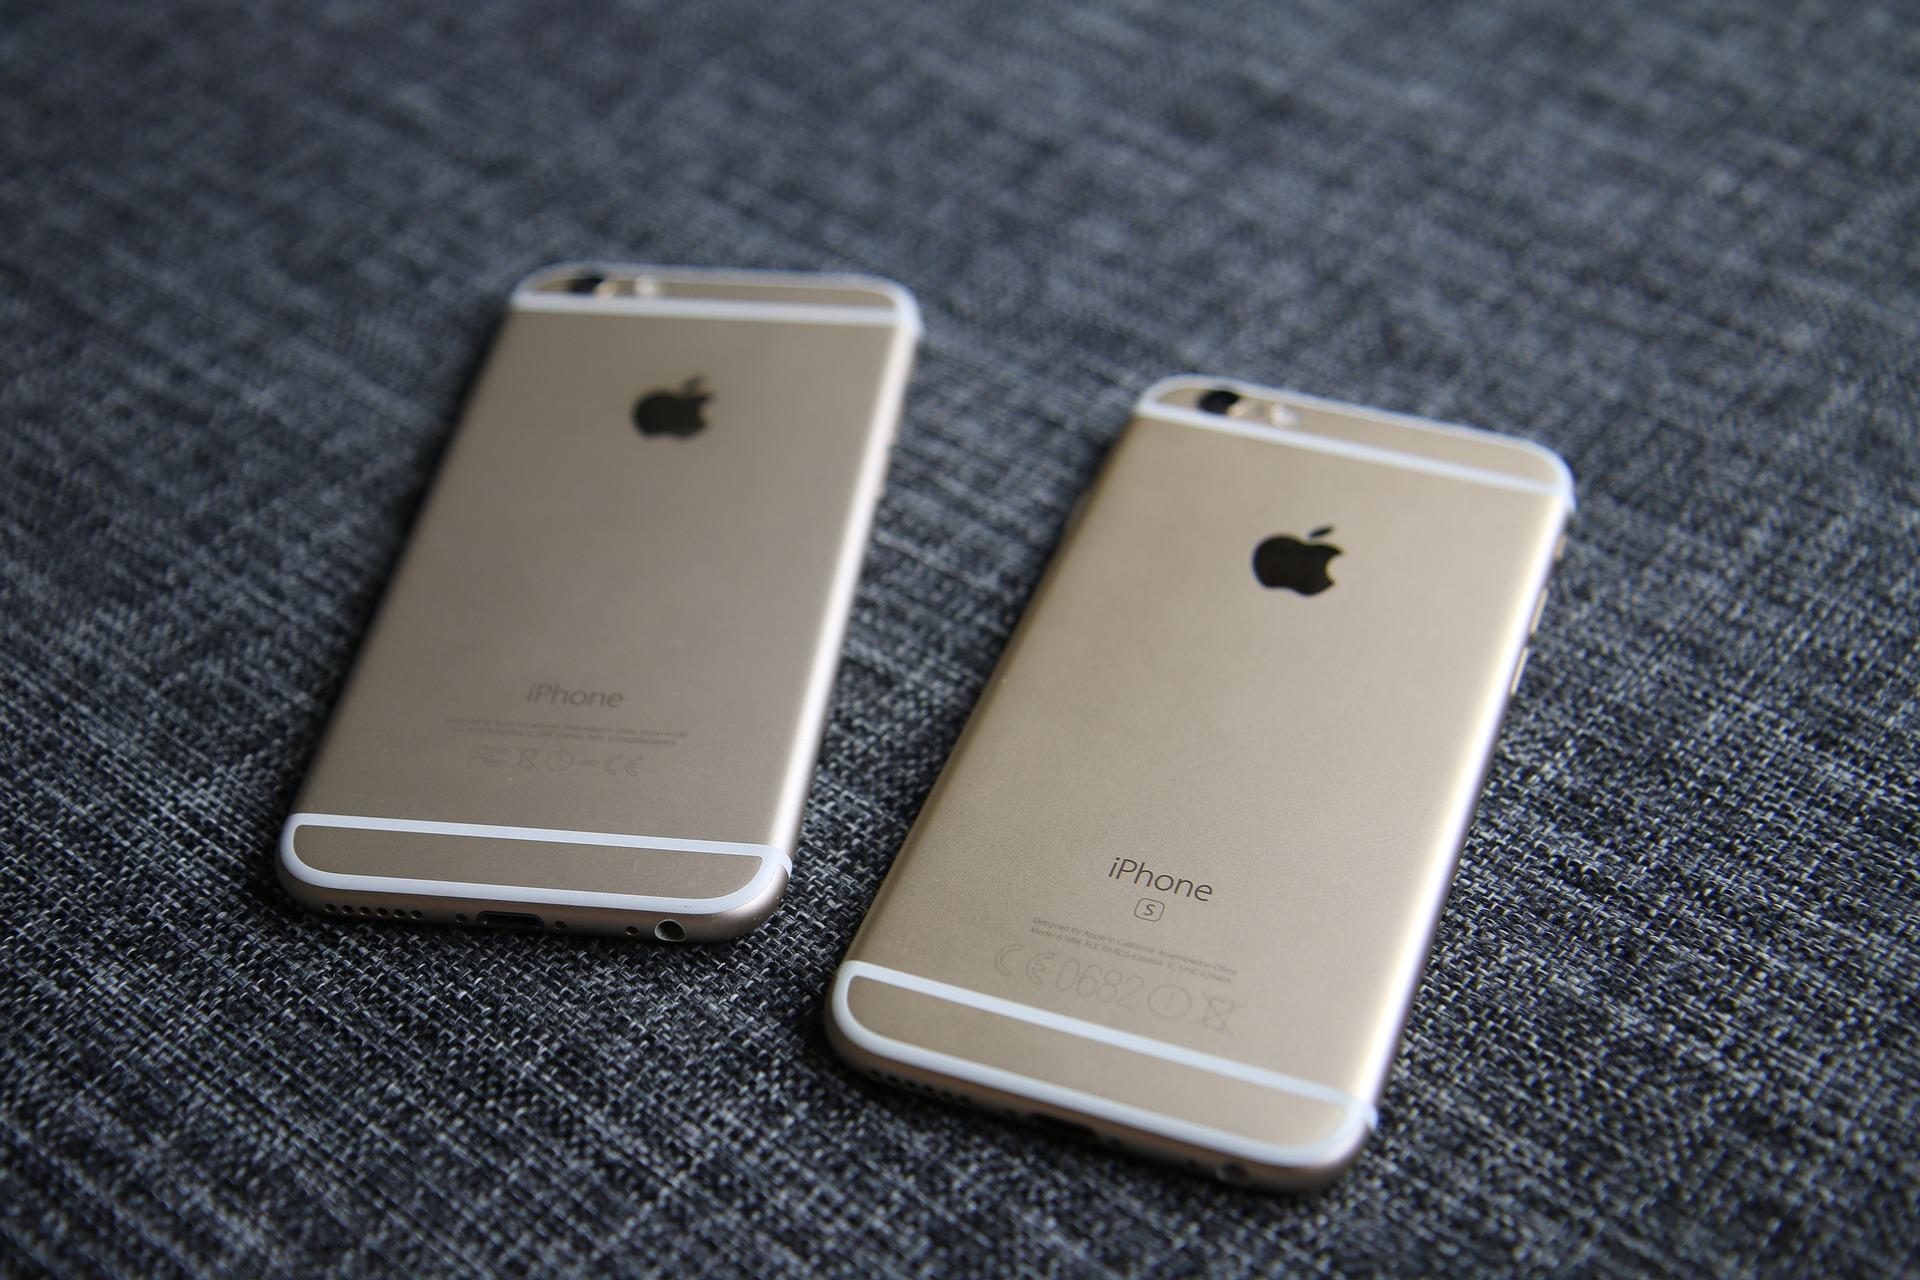 iphone-1125135_1920